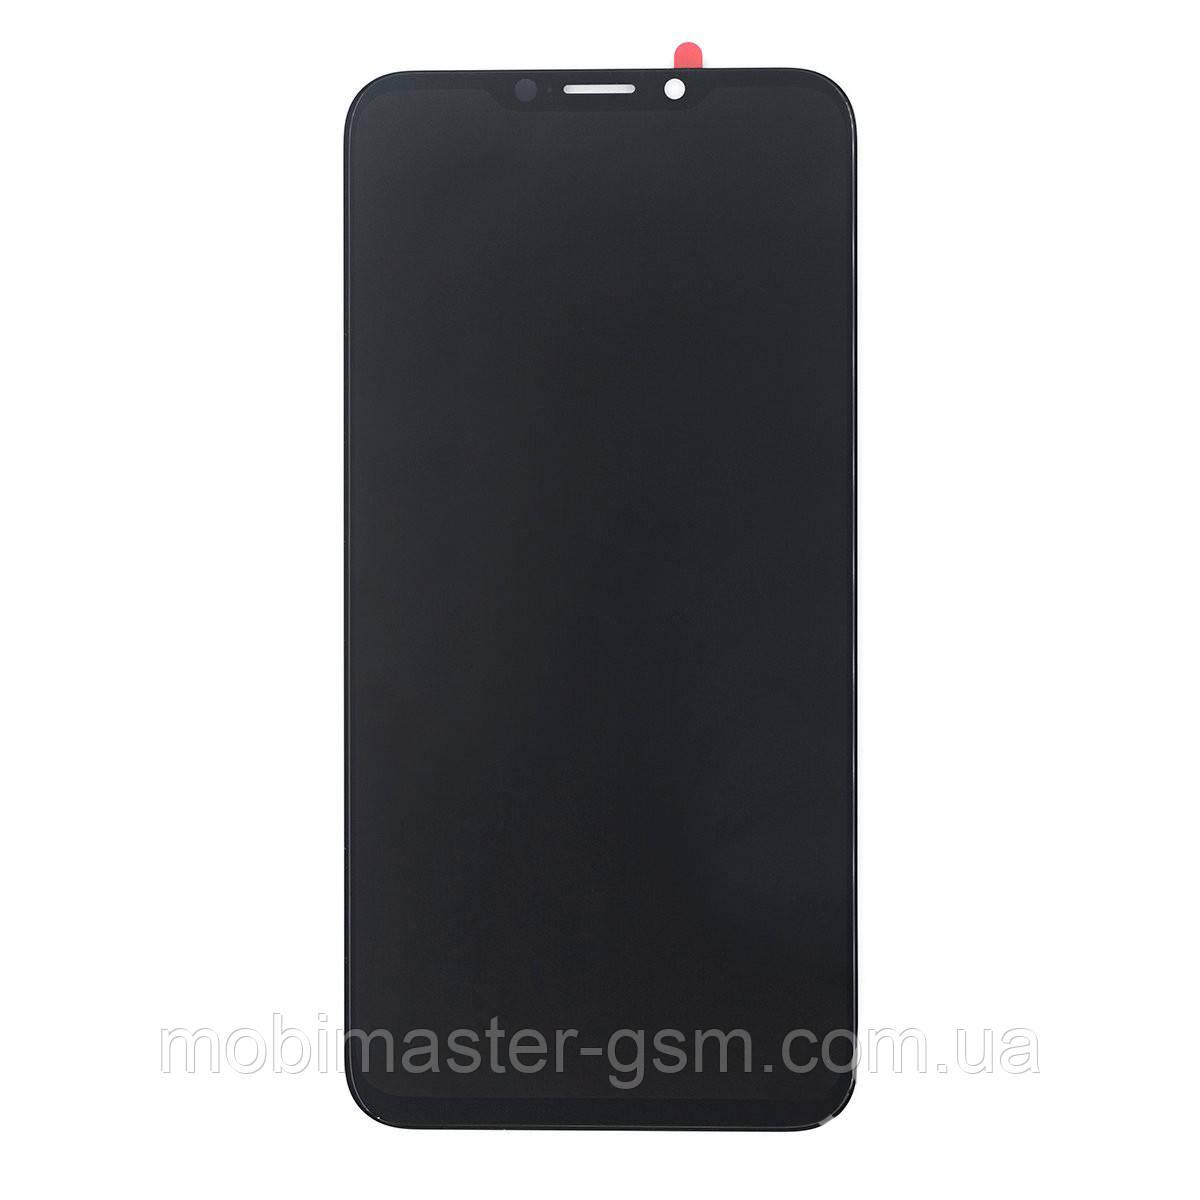 Дисплейный модуль Meizu X8 black